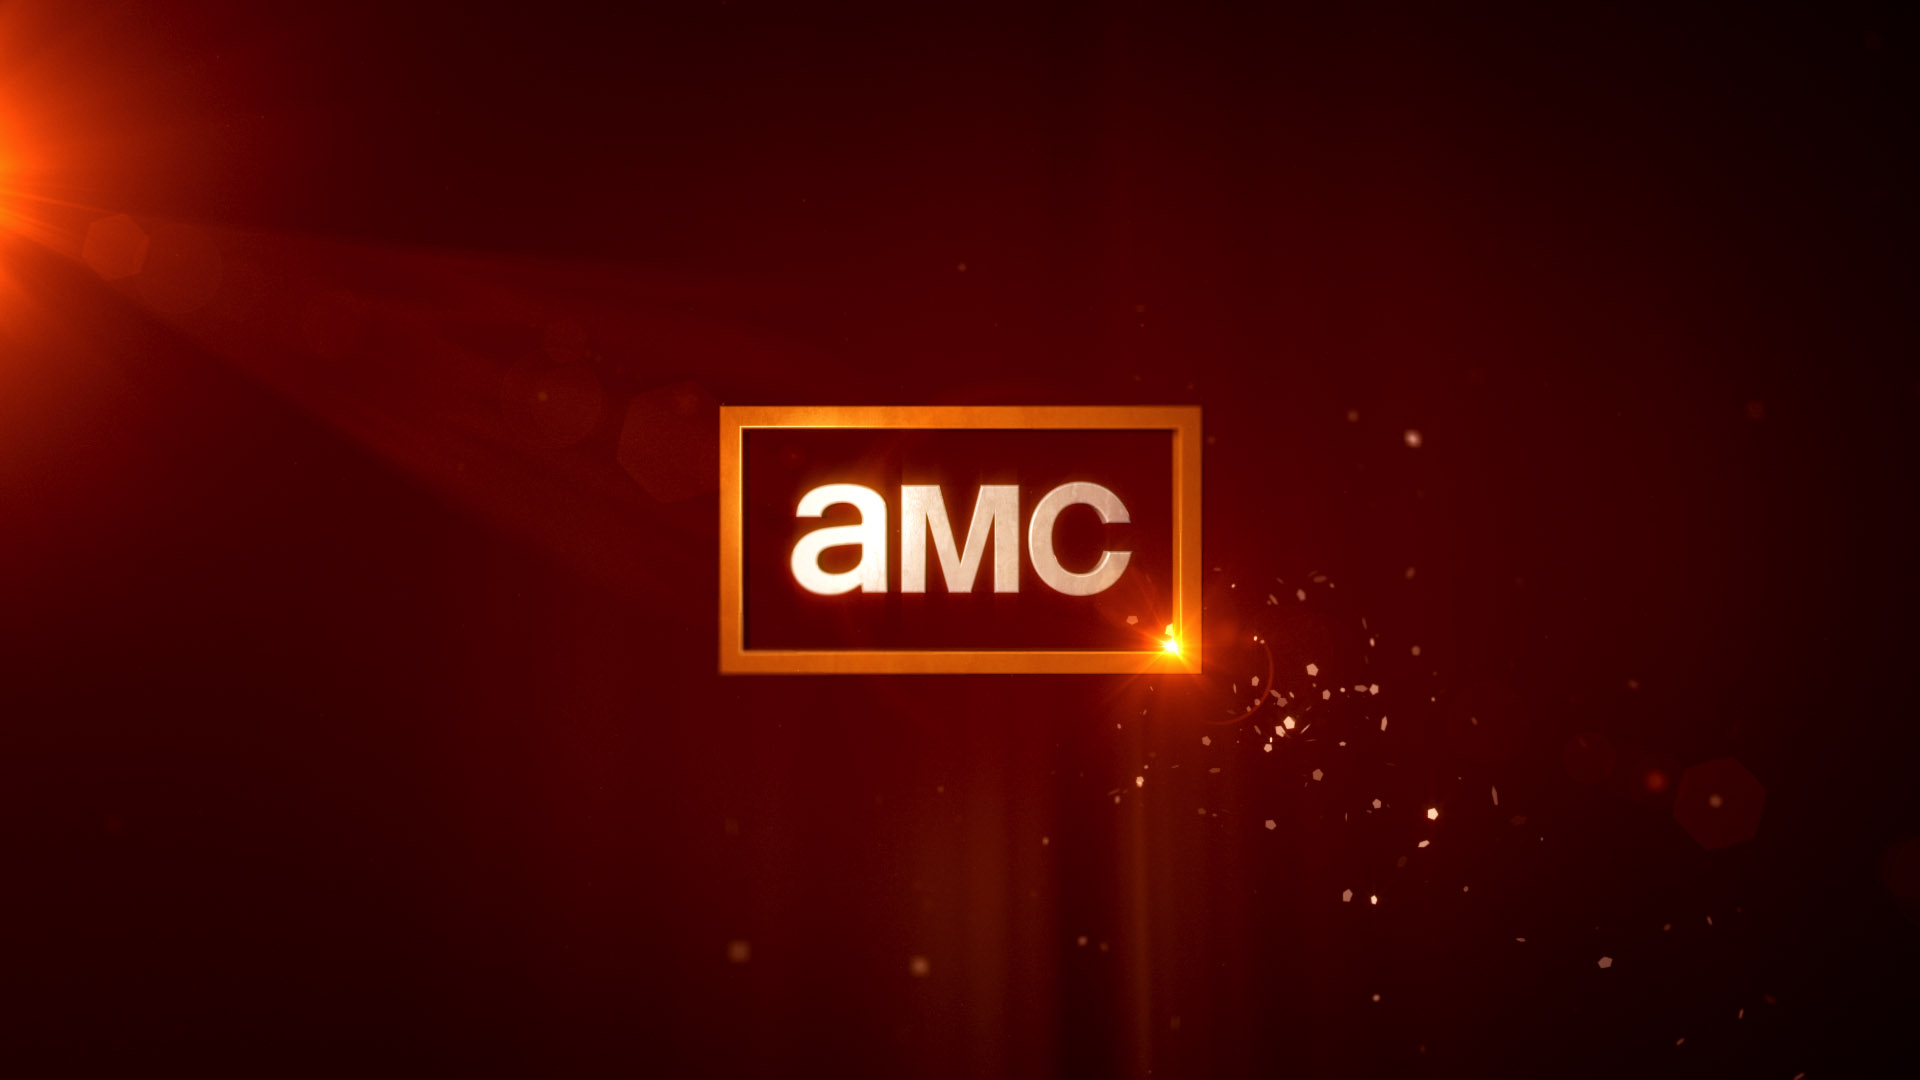 AMC_Image_Comp_01.jpg